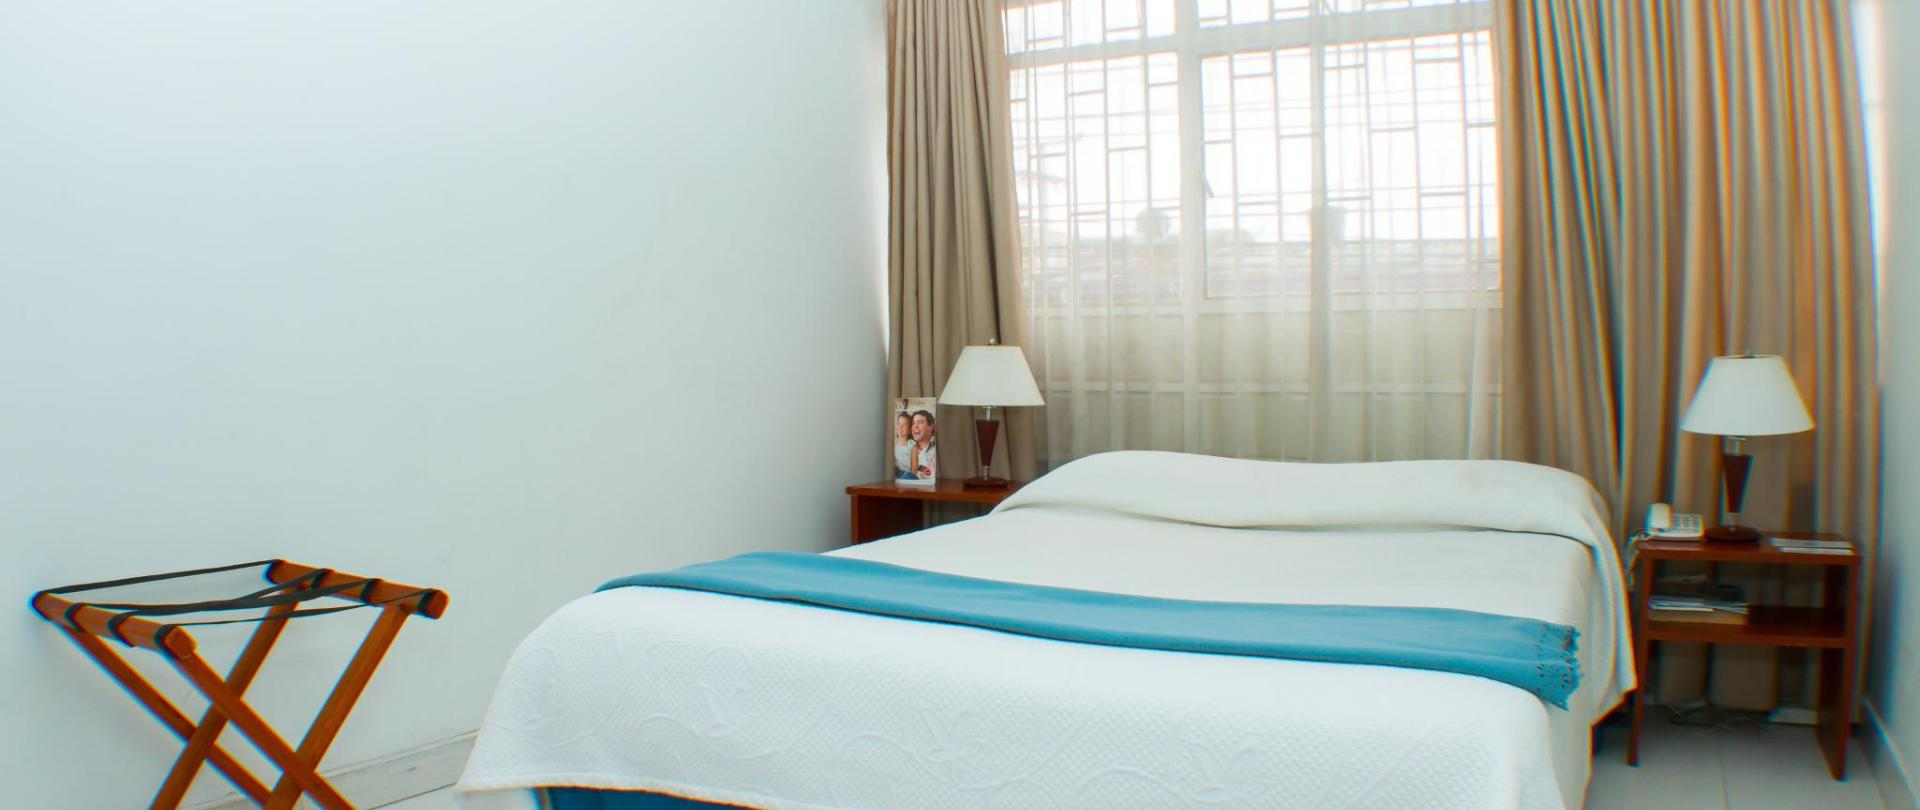 Hotel_Siar-8373.jpg